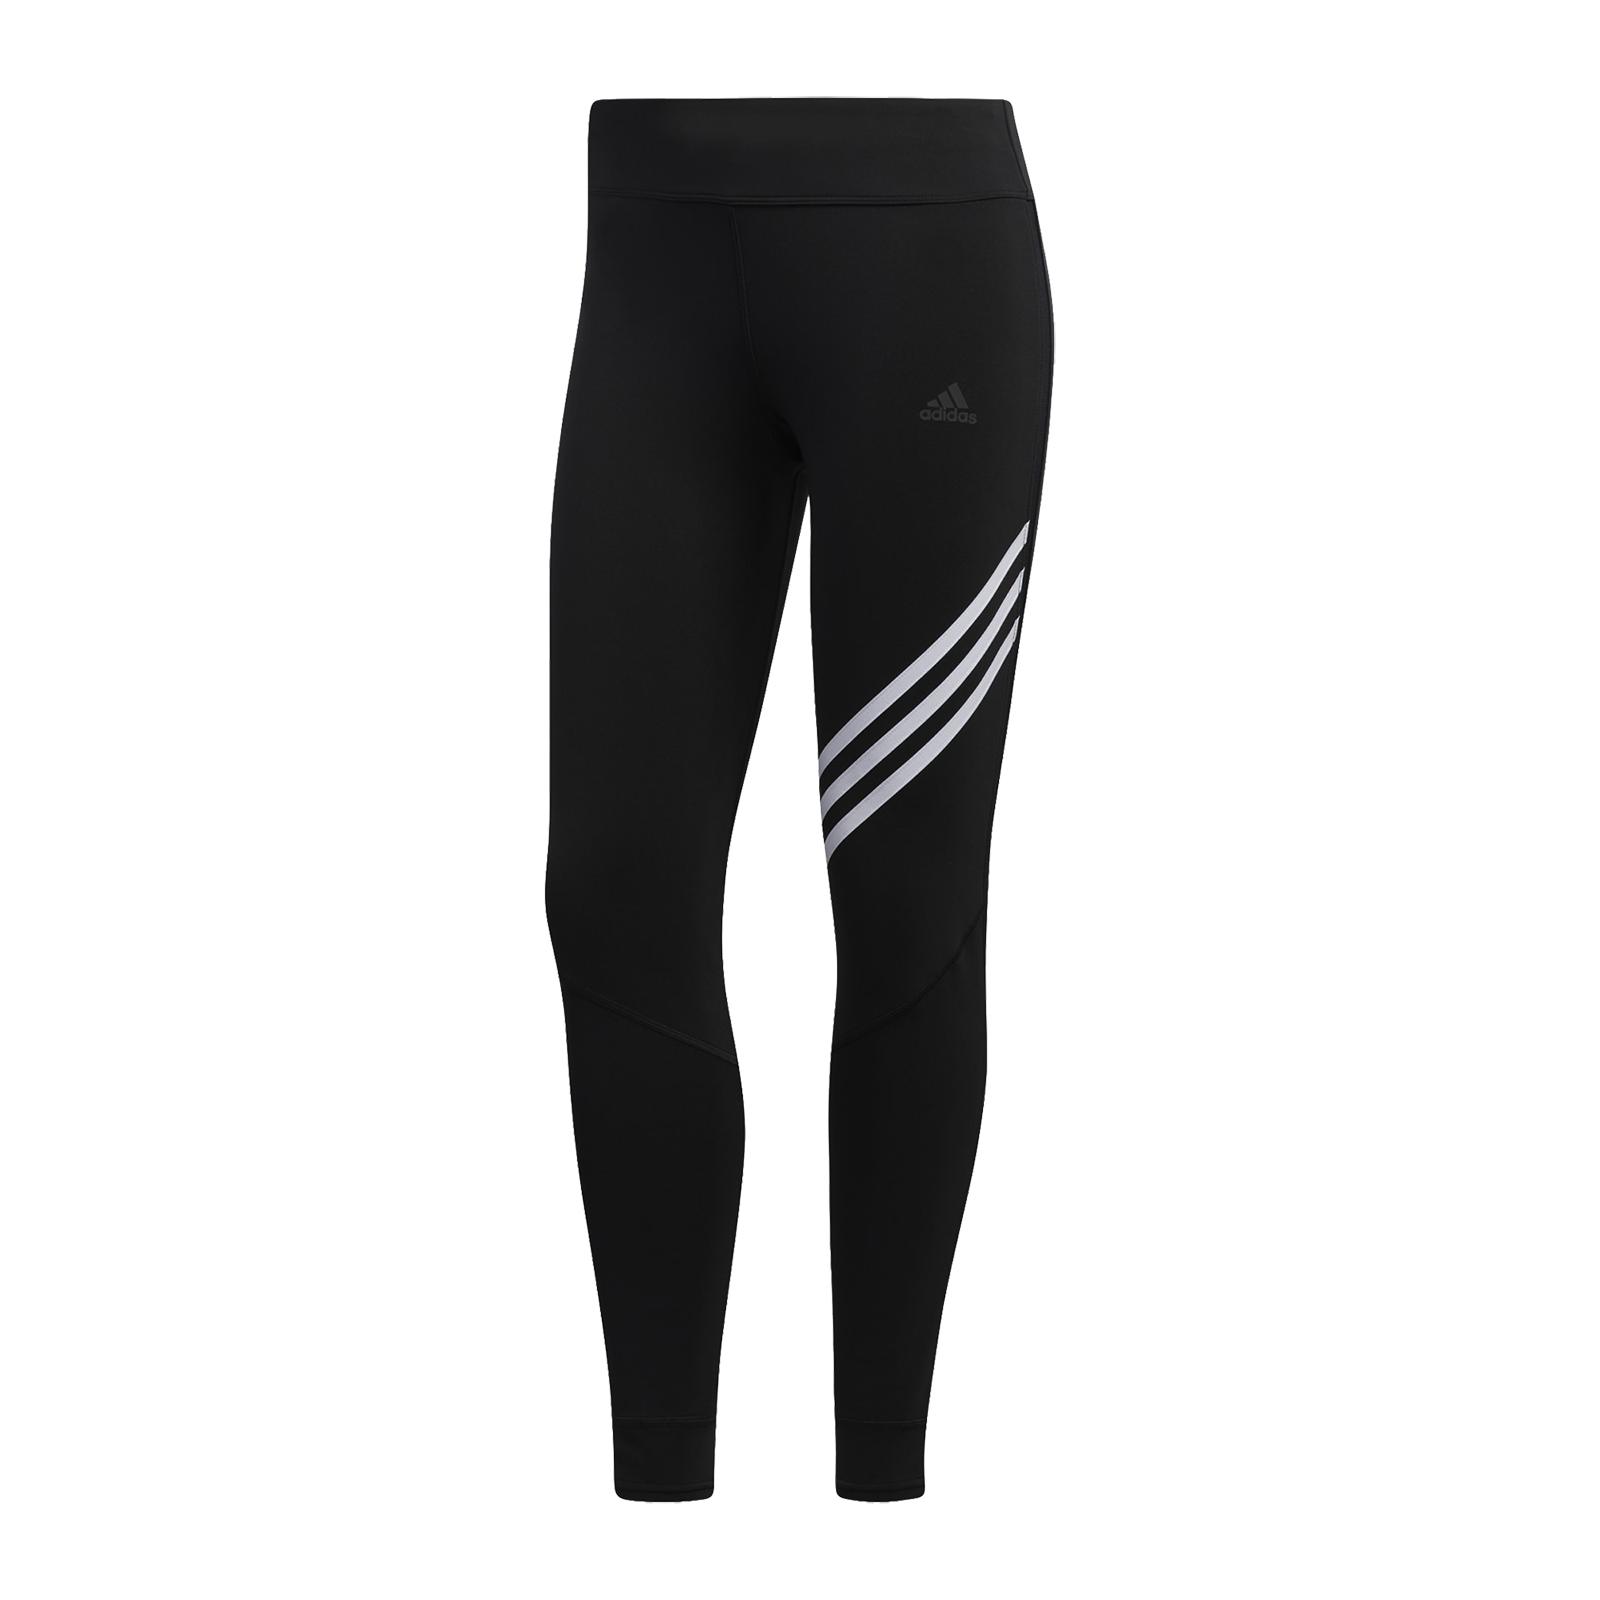 adidas 緊身褲 Run It 3-Stripes 7/8 9分褲 愛迪達 女款 運動褲【ACS】 ED9305